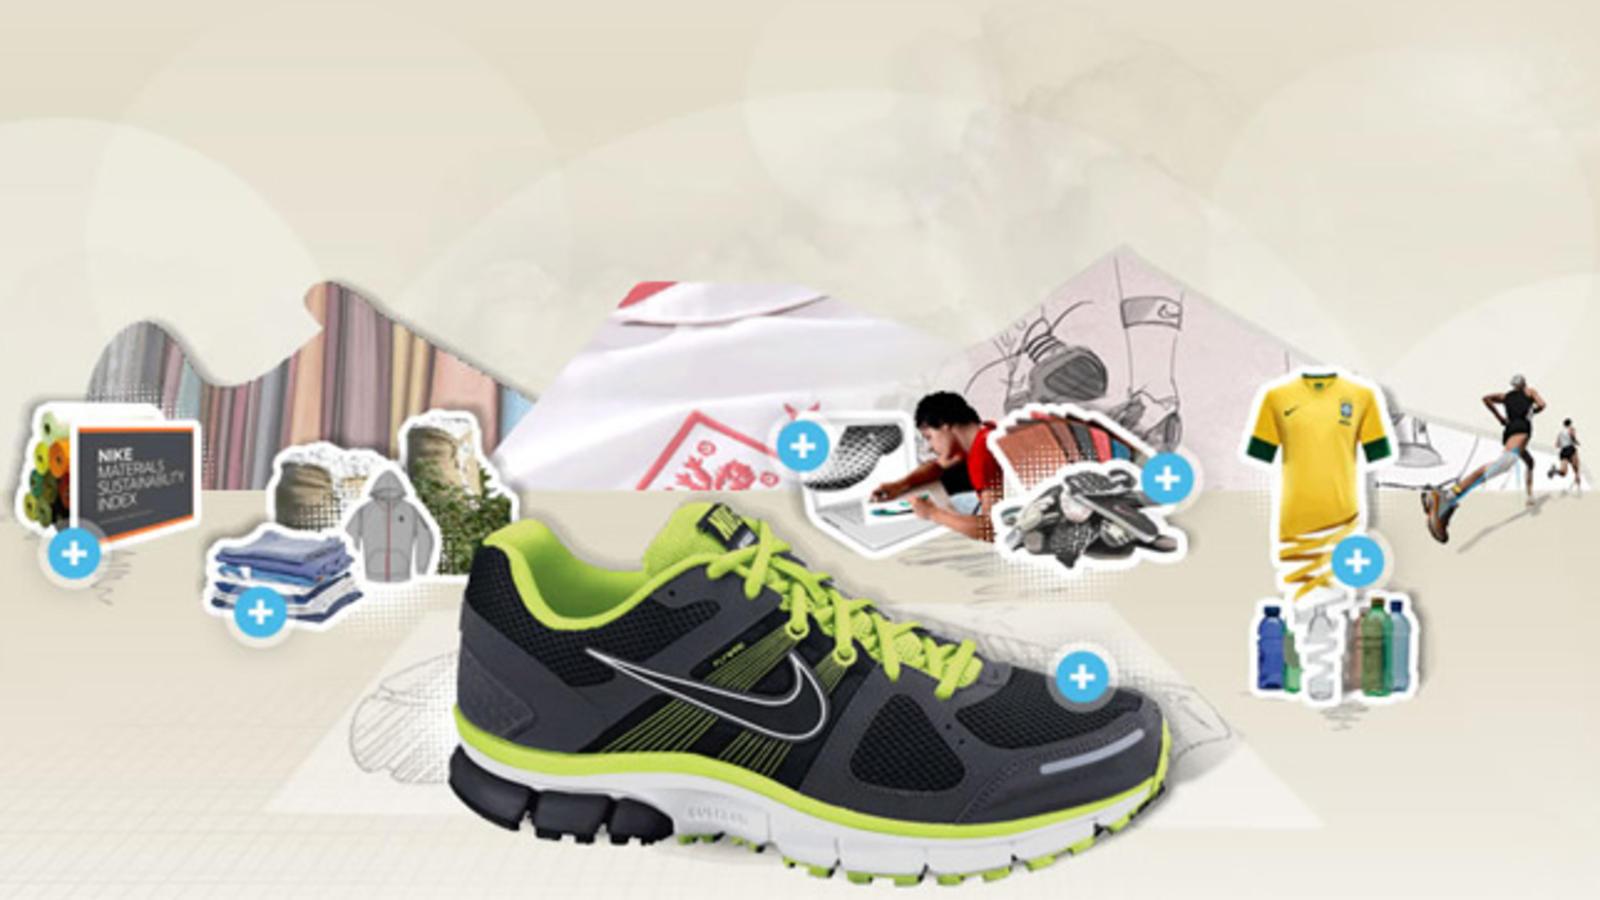 FY10-11 Sustainable Business Performance Summary - Nike News